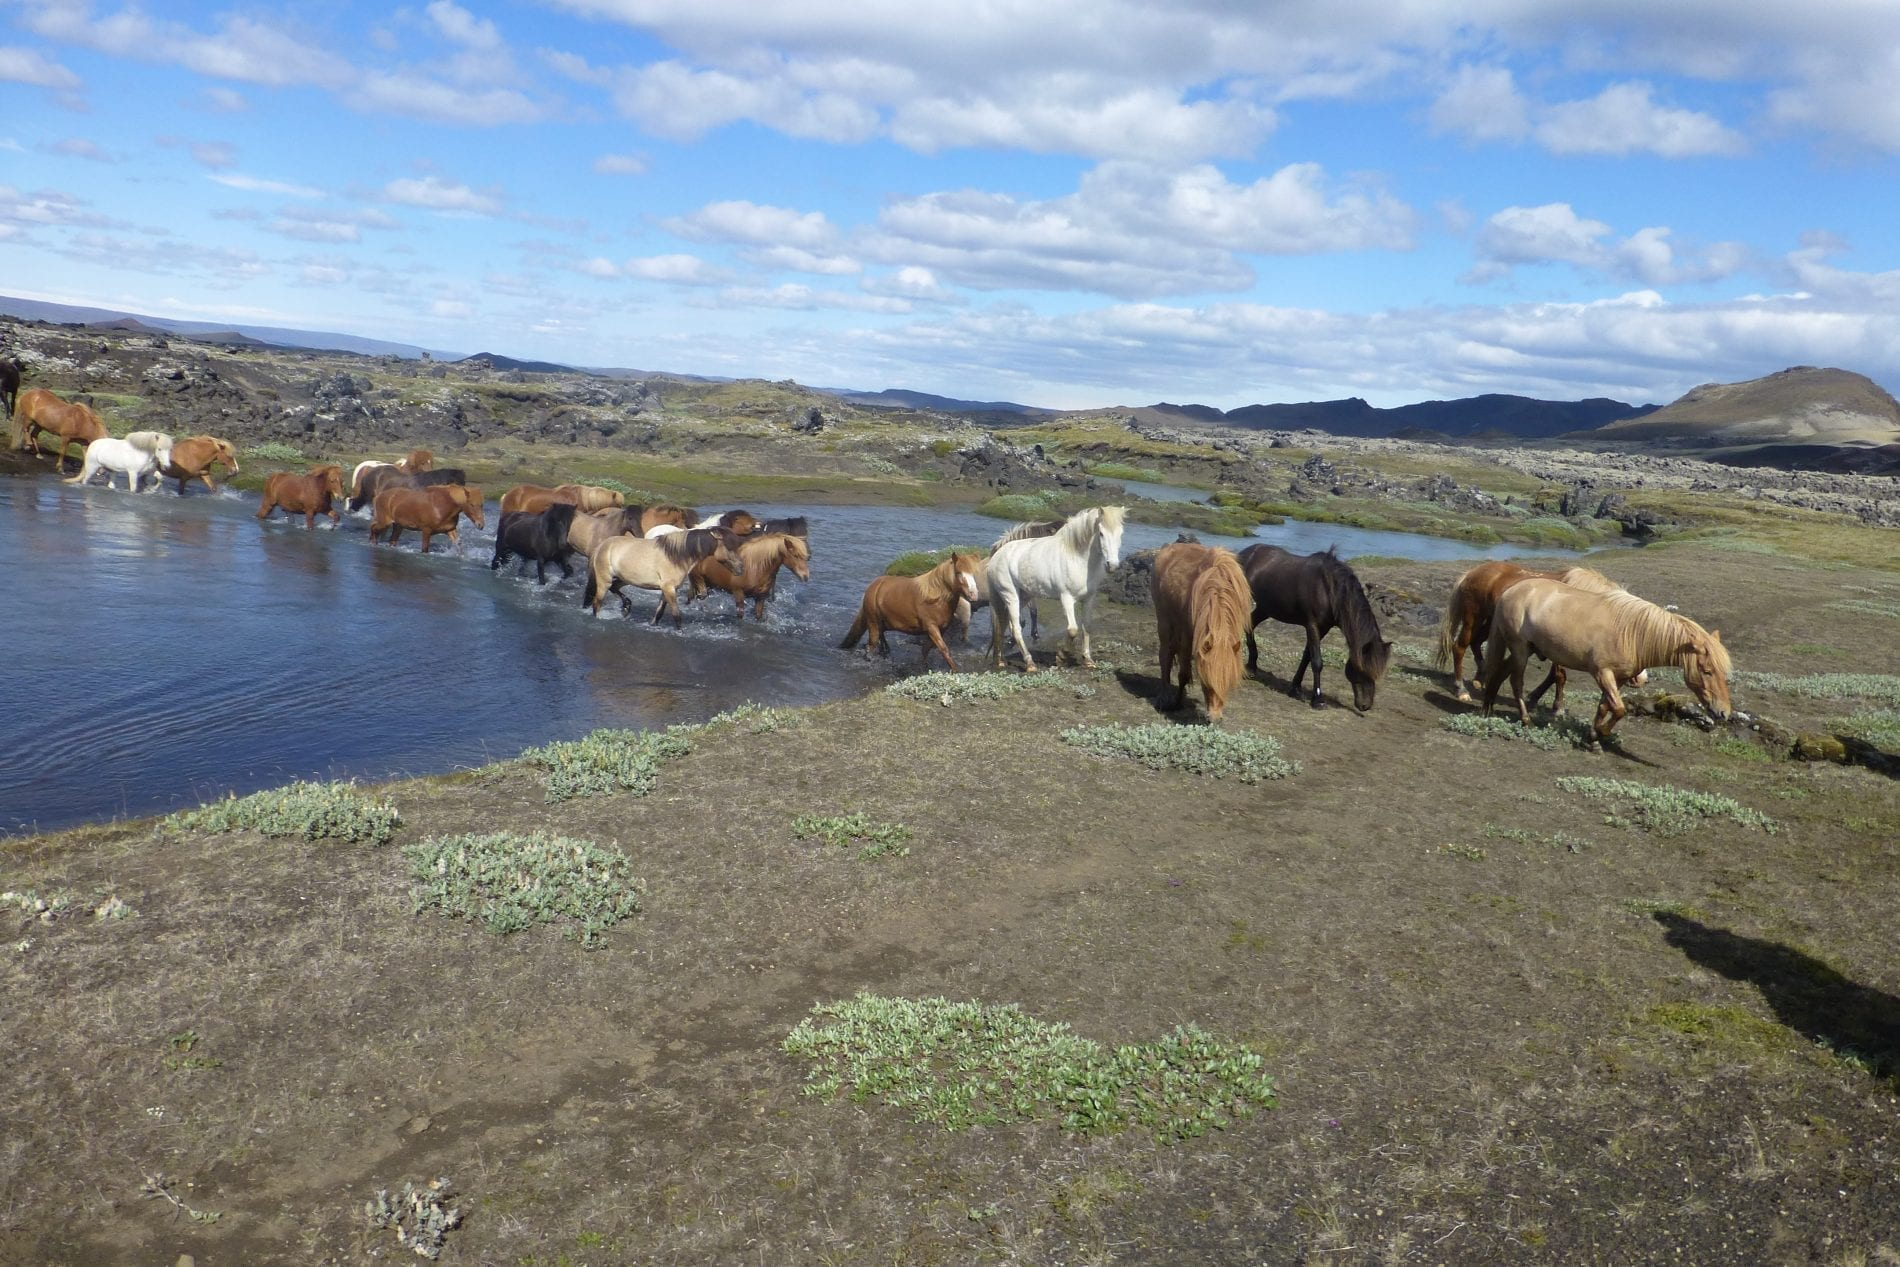 A herd of horses calmly cross a river near Landmannalaugar